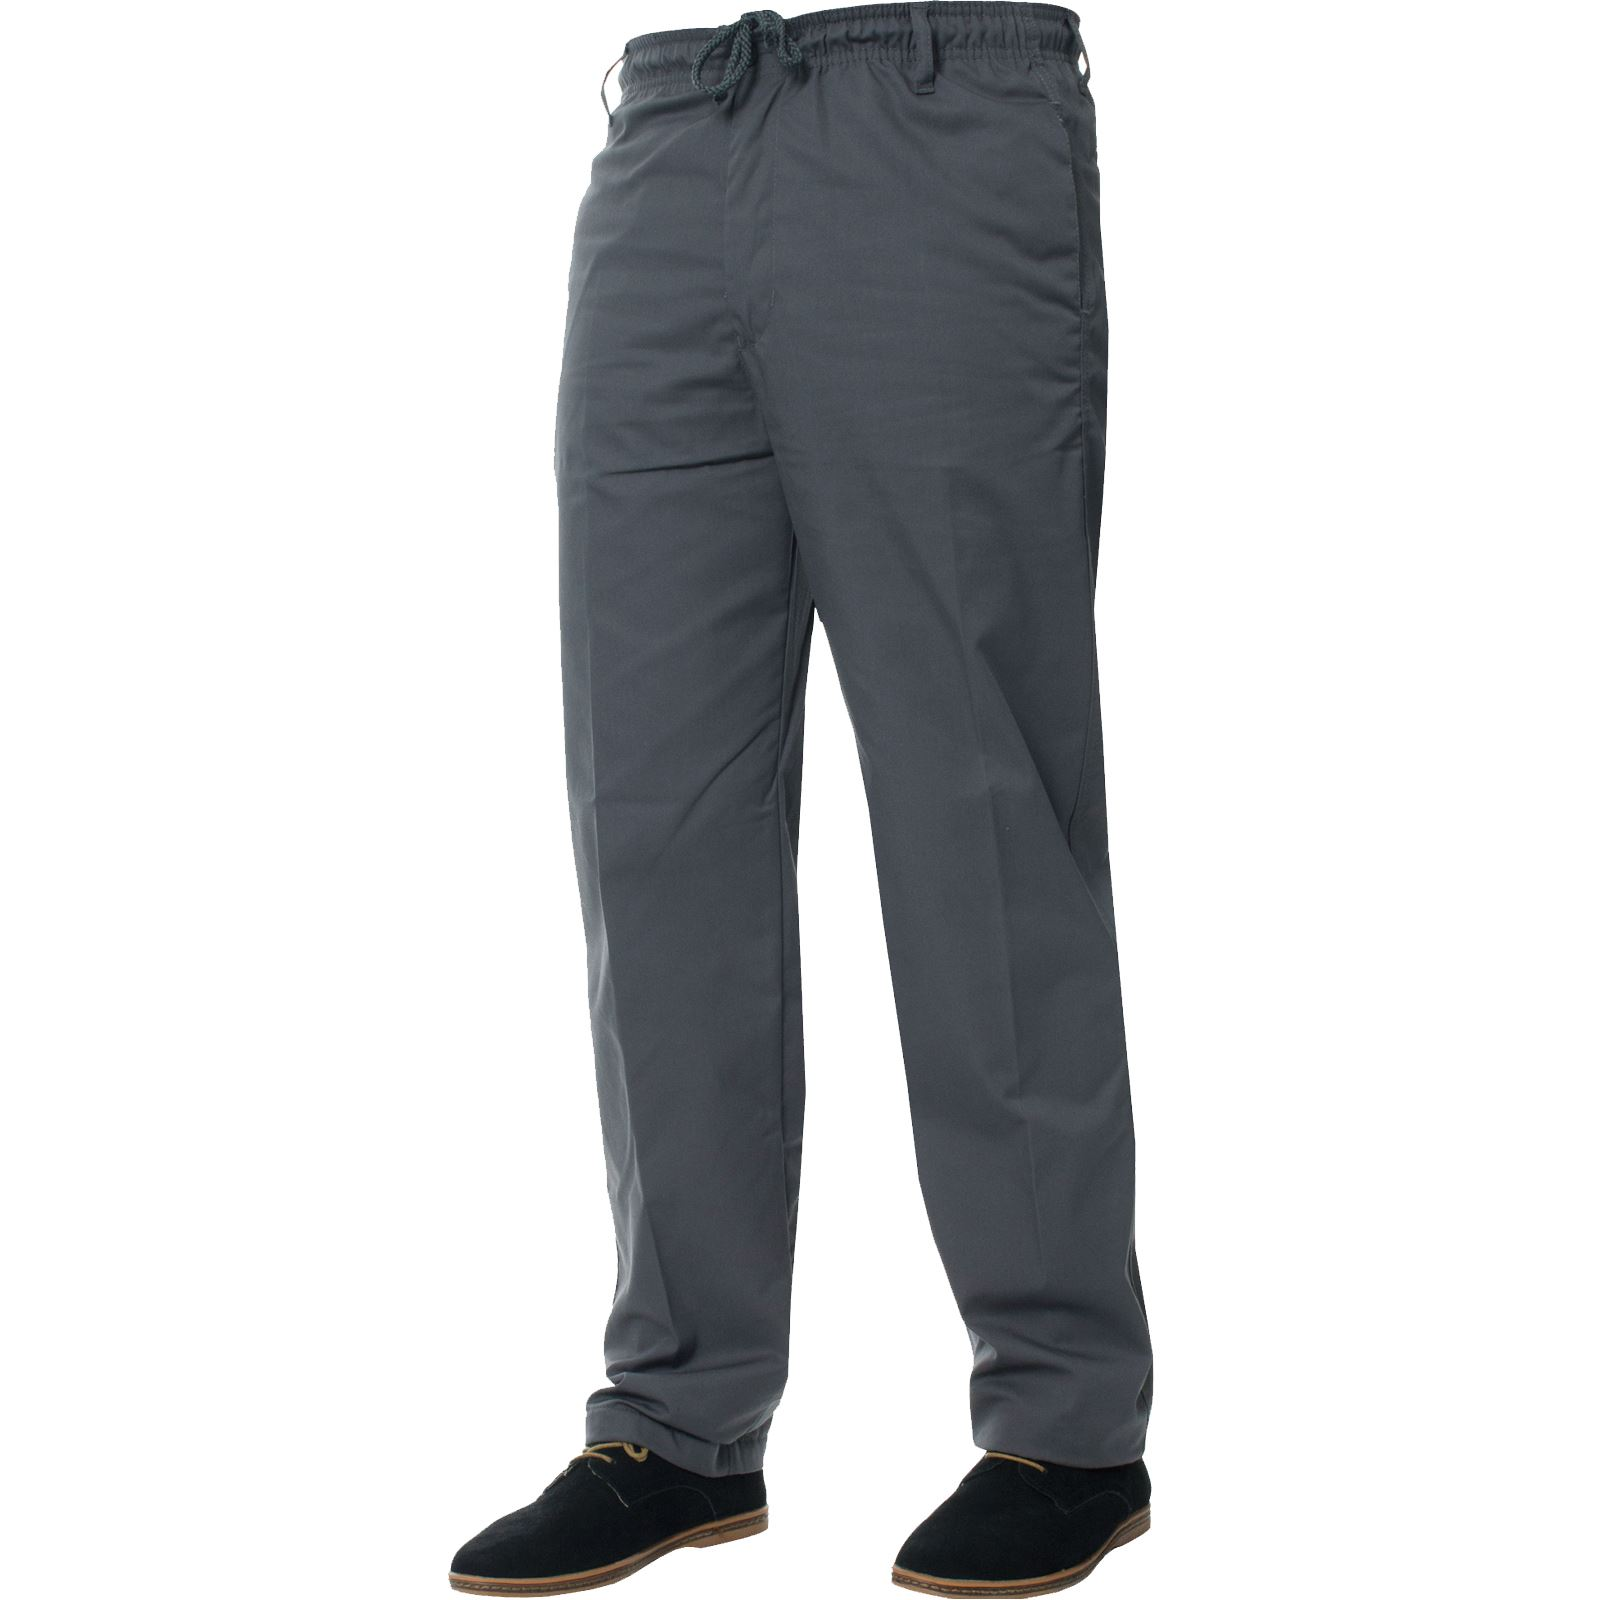 Para-Hombres-Pantalones-De-Rugby-Kruze-cintura-elastica-con-cordon-pantalones-REGULAR-King-Tamanos miniatura 26